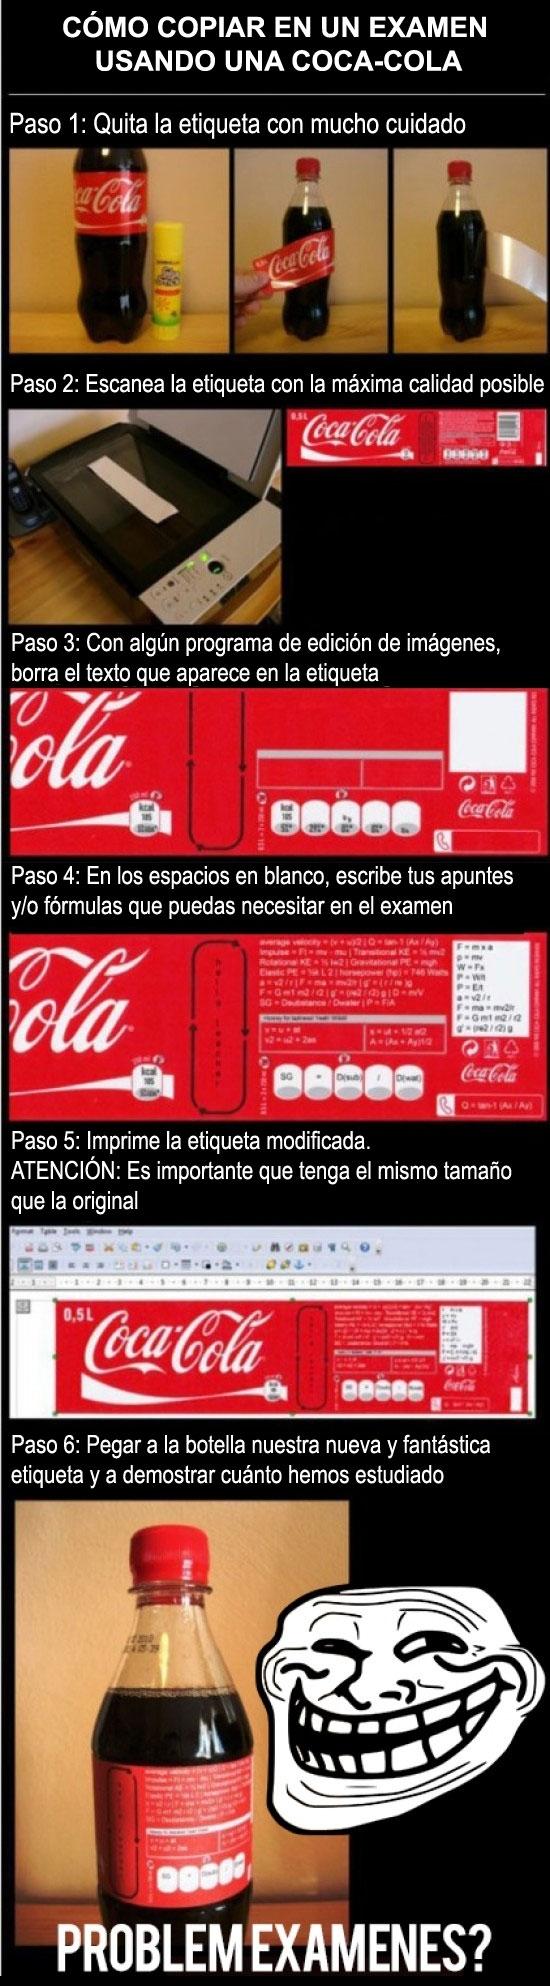 Coca-Cola,copiar,examenes,Trollface,Trollscience